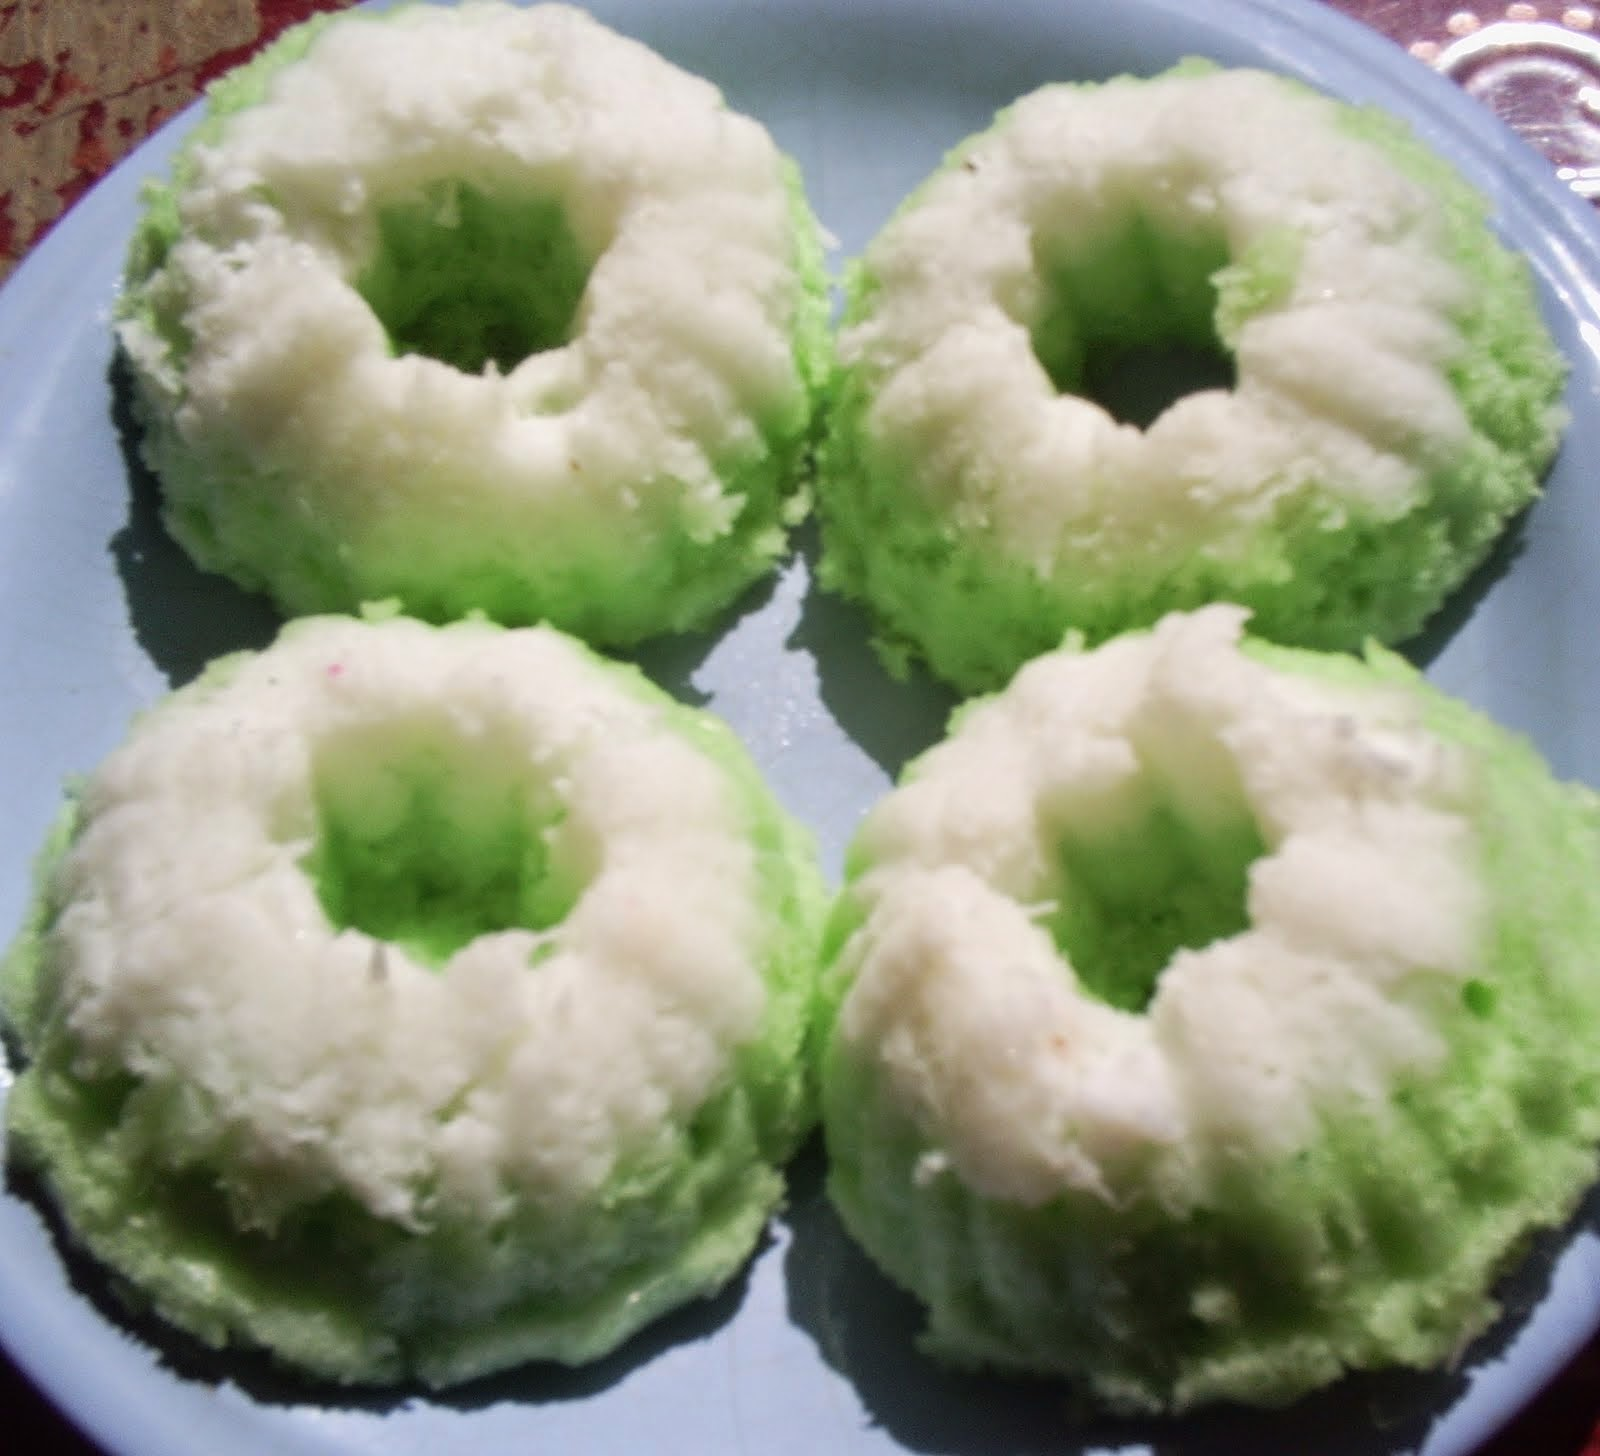 http://www.kabarloka.com/2014/06/cara-membuat-kue-putu-ayu-yang-empuk.html